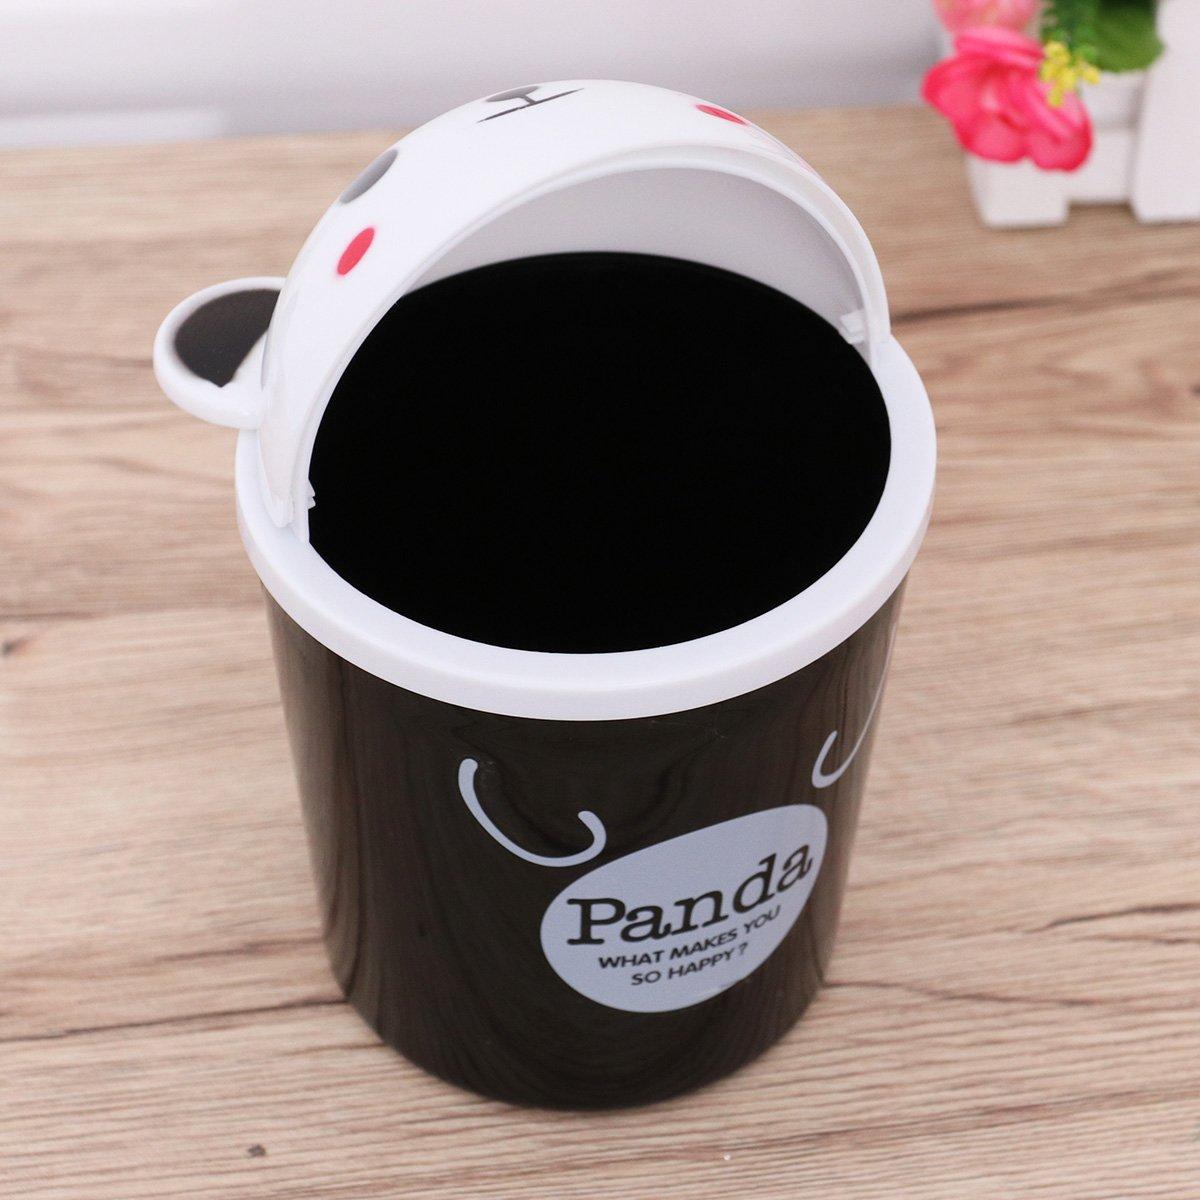 Panda nero TOYMYTOY Mini Cestino Scrivania a Forma di Cartone Animal Gettacarte Pattumiera Carta Portarifiuti da Tavolo